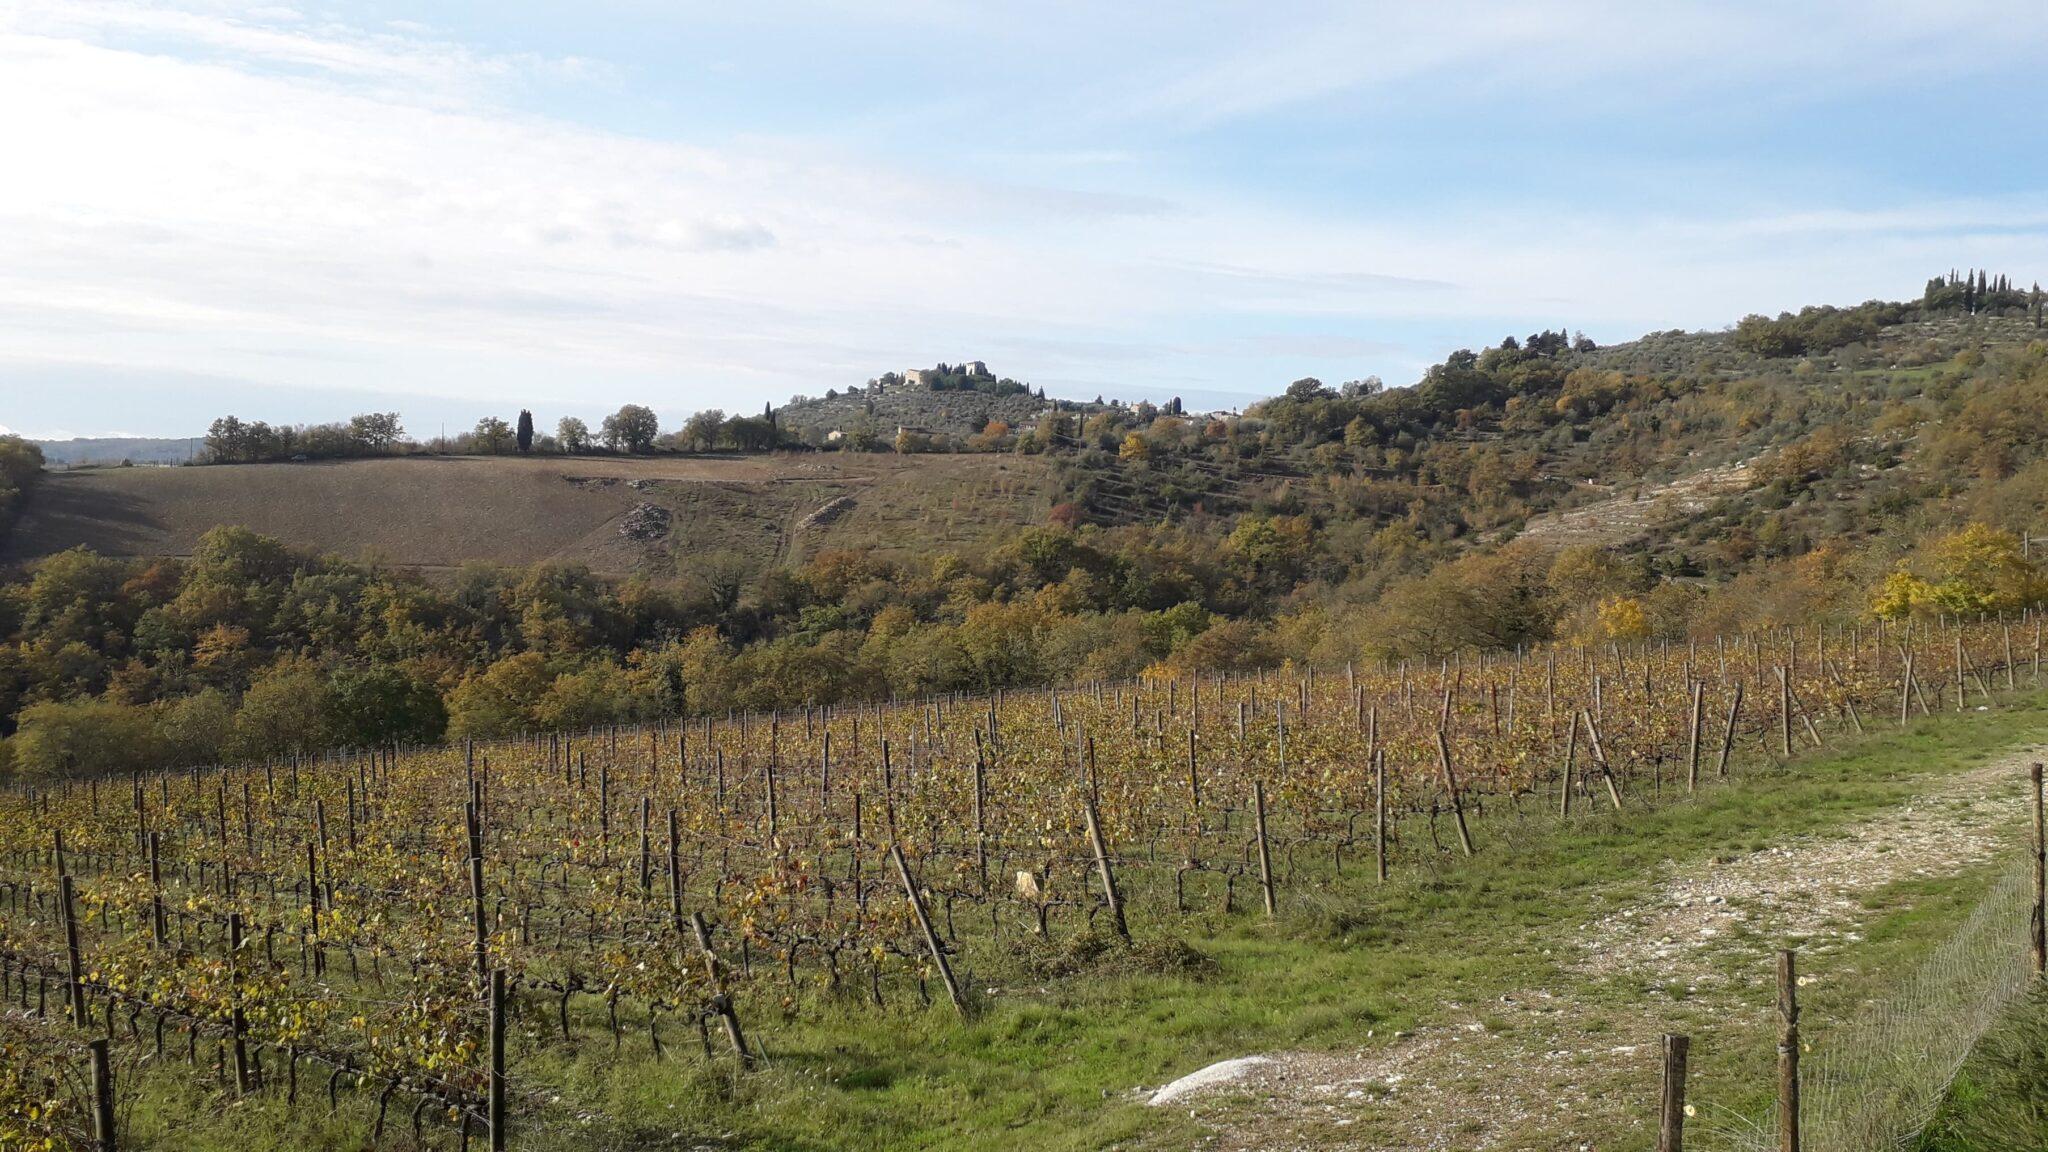 Vakantie in Toscane - Chianti streek herfst